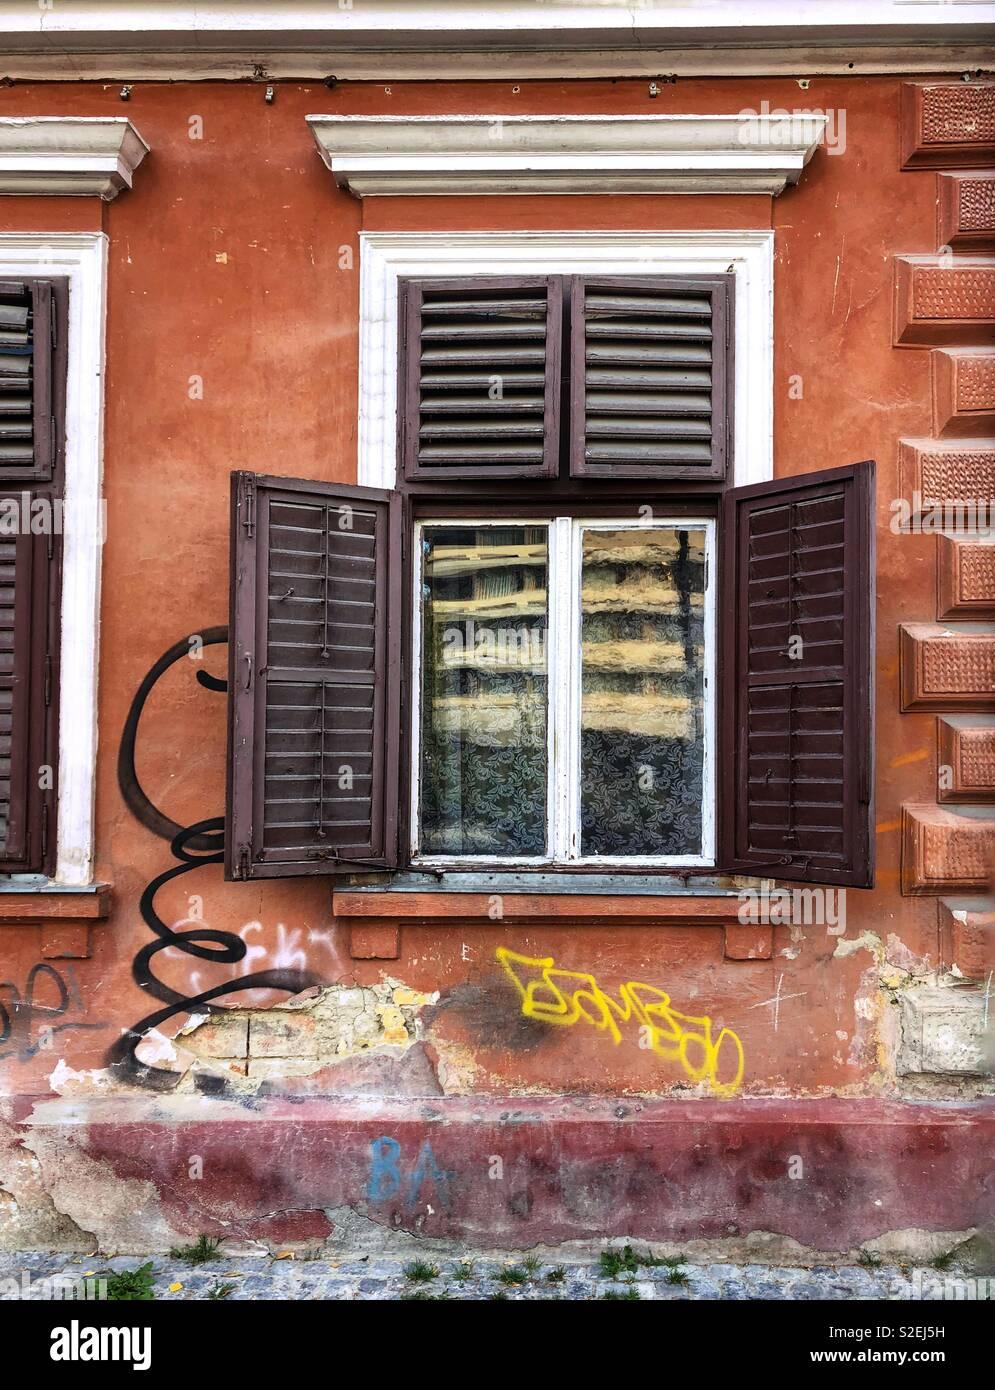 Open shutters. - Stock Image